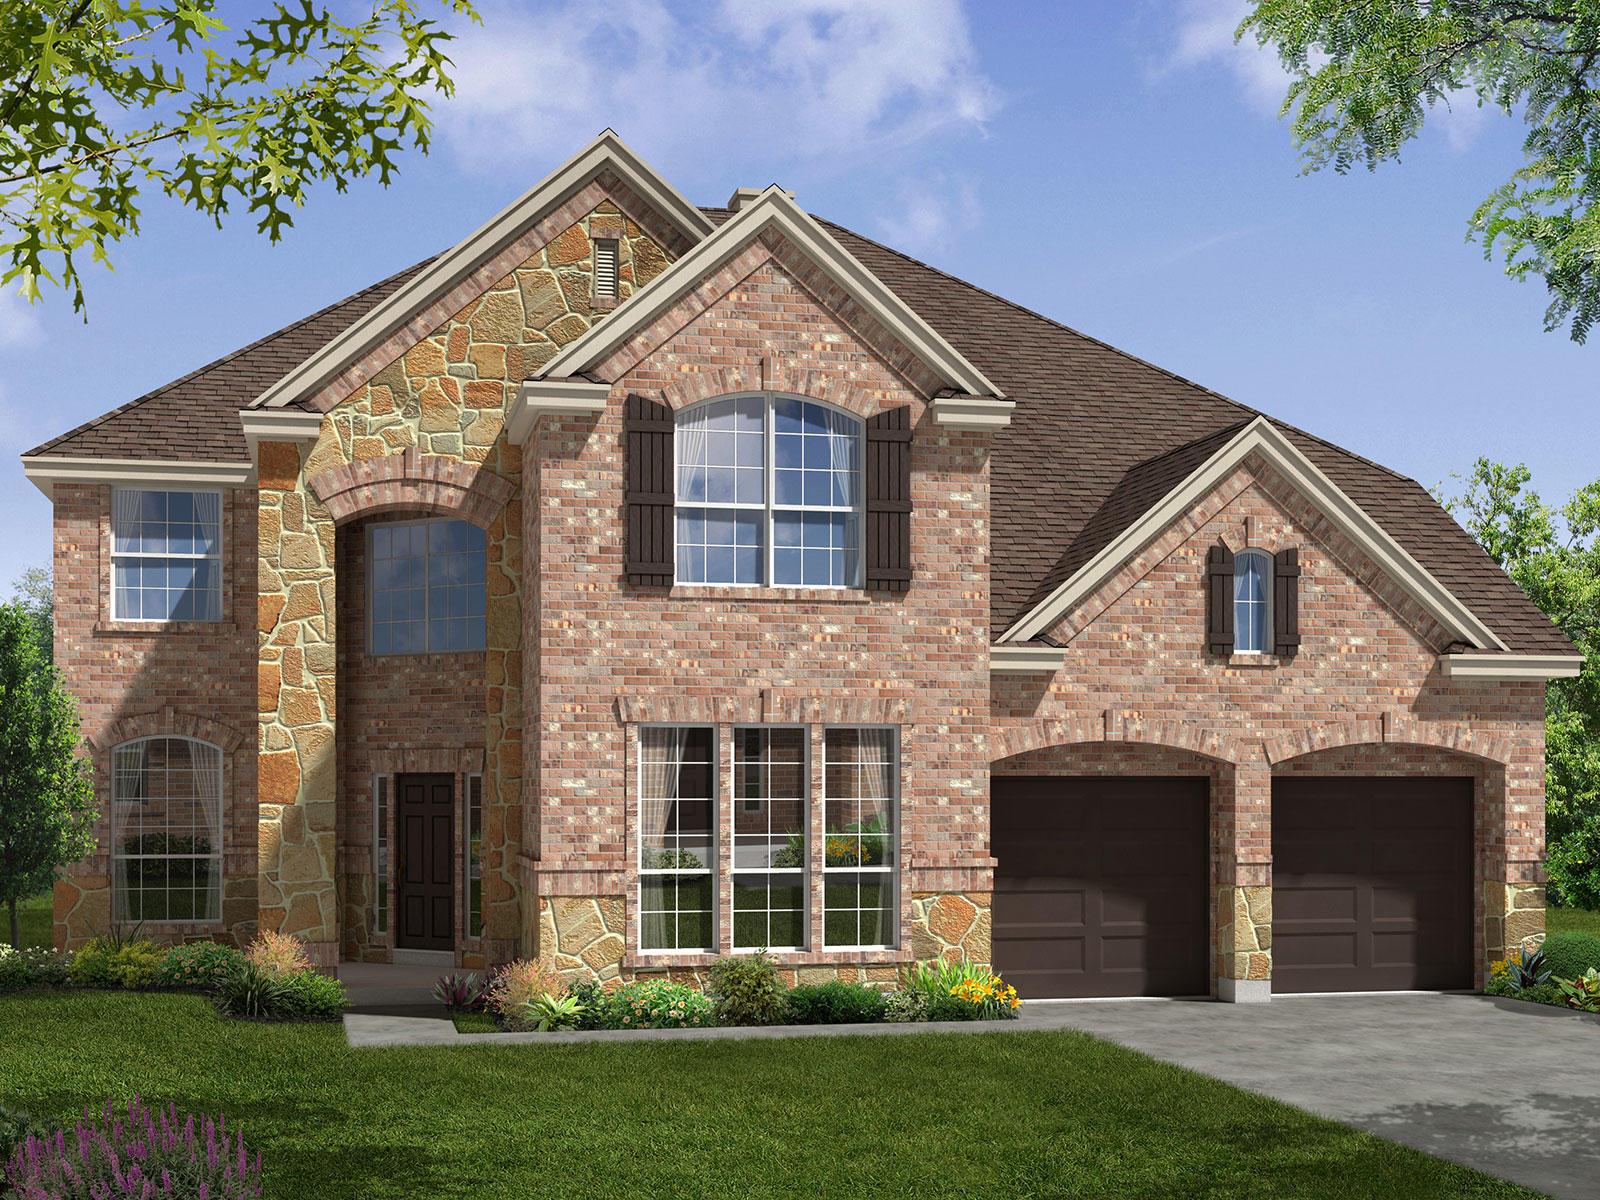 San Angelo Ii 4542 Plan For Sale Rosenberg Tx Trulia